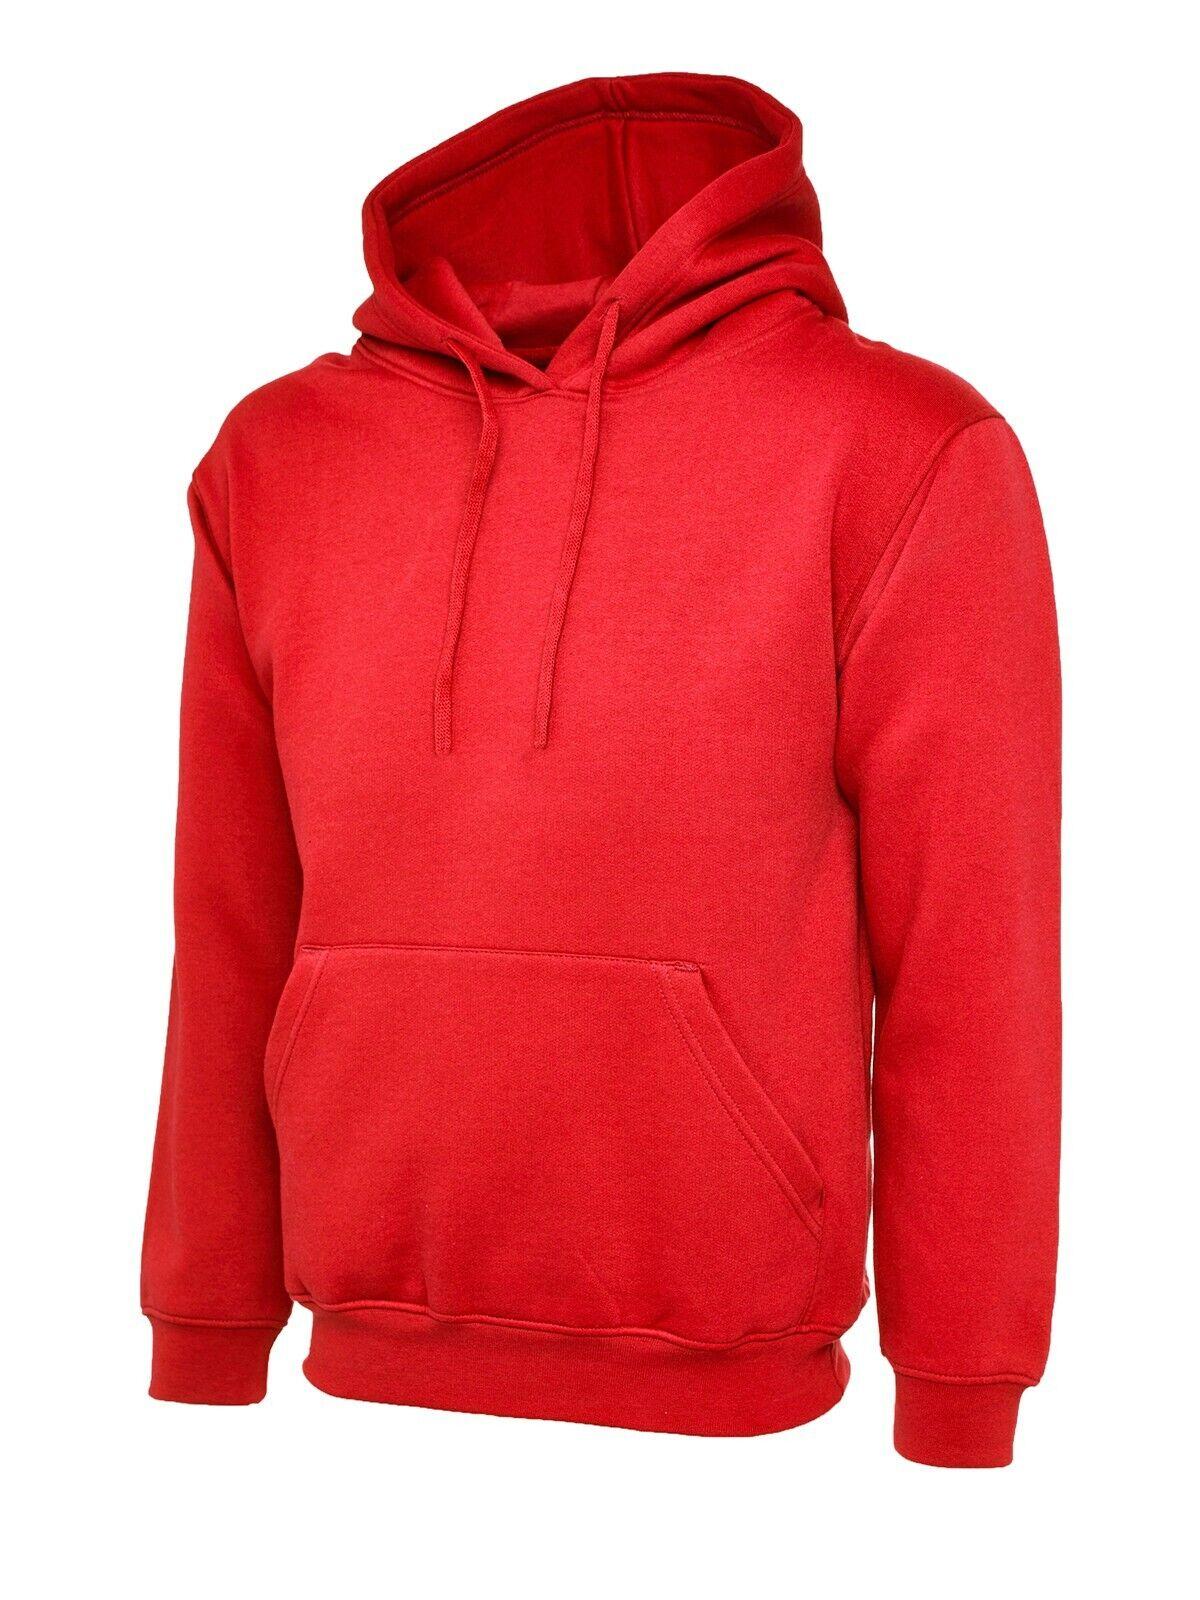 awdis heavyweight hoodie JH101 Red size M